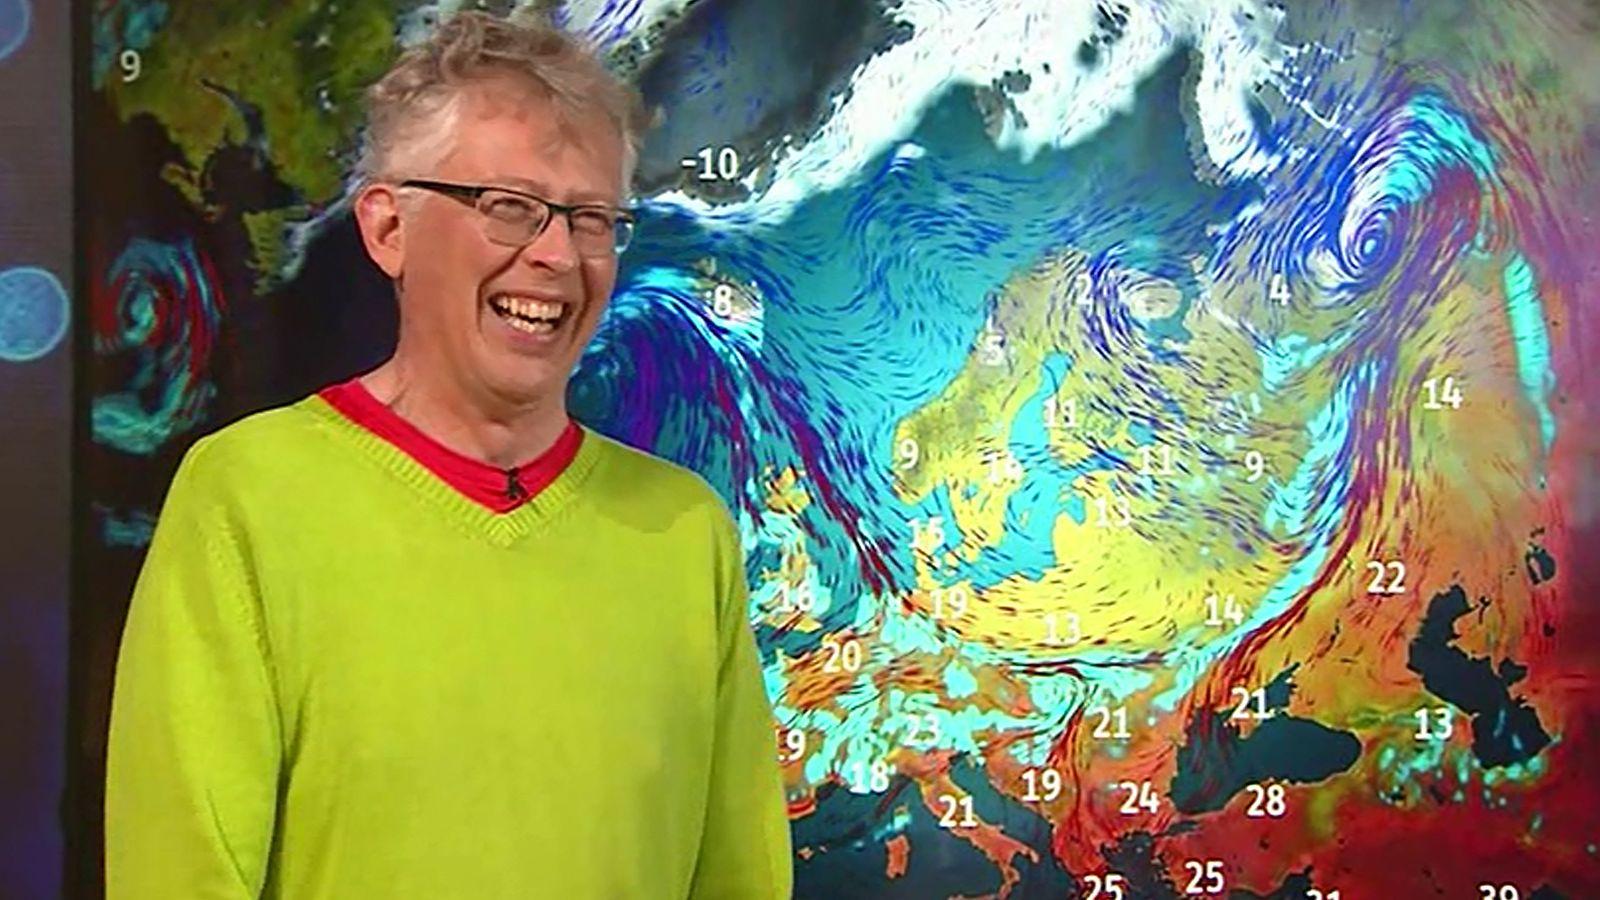 Pekka Pouta